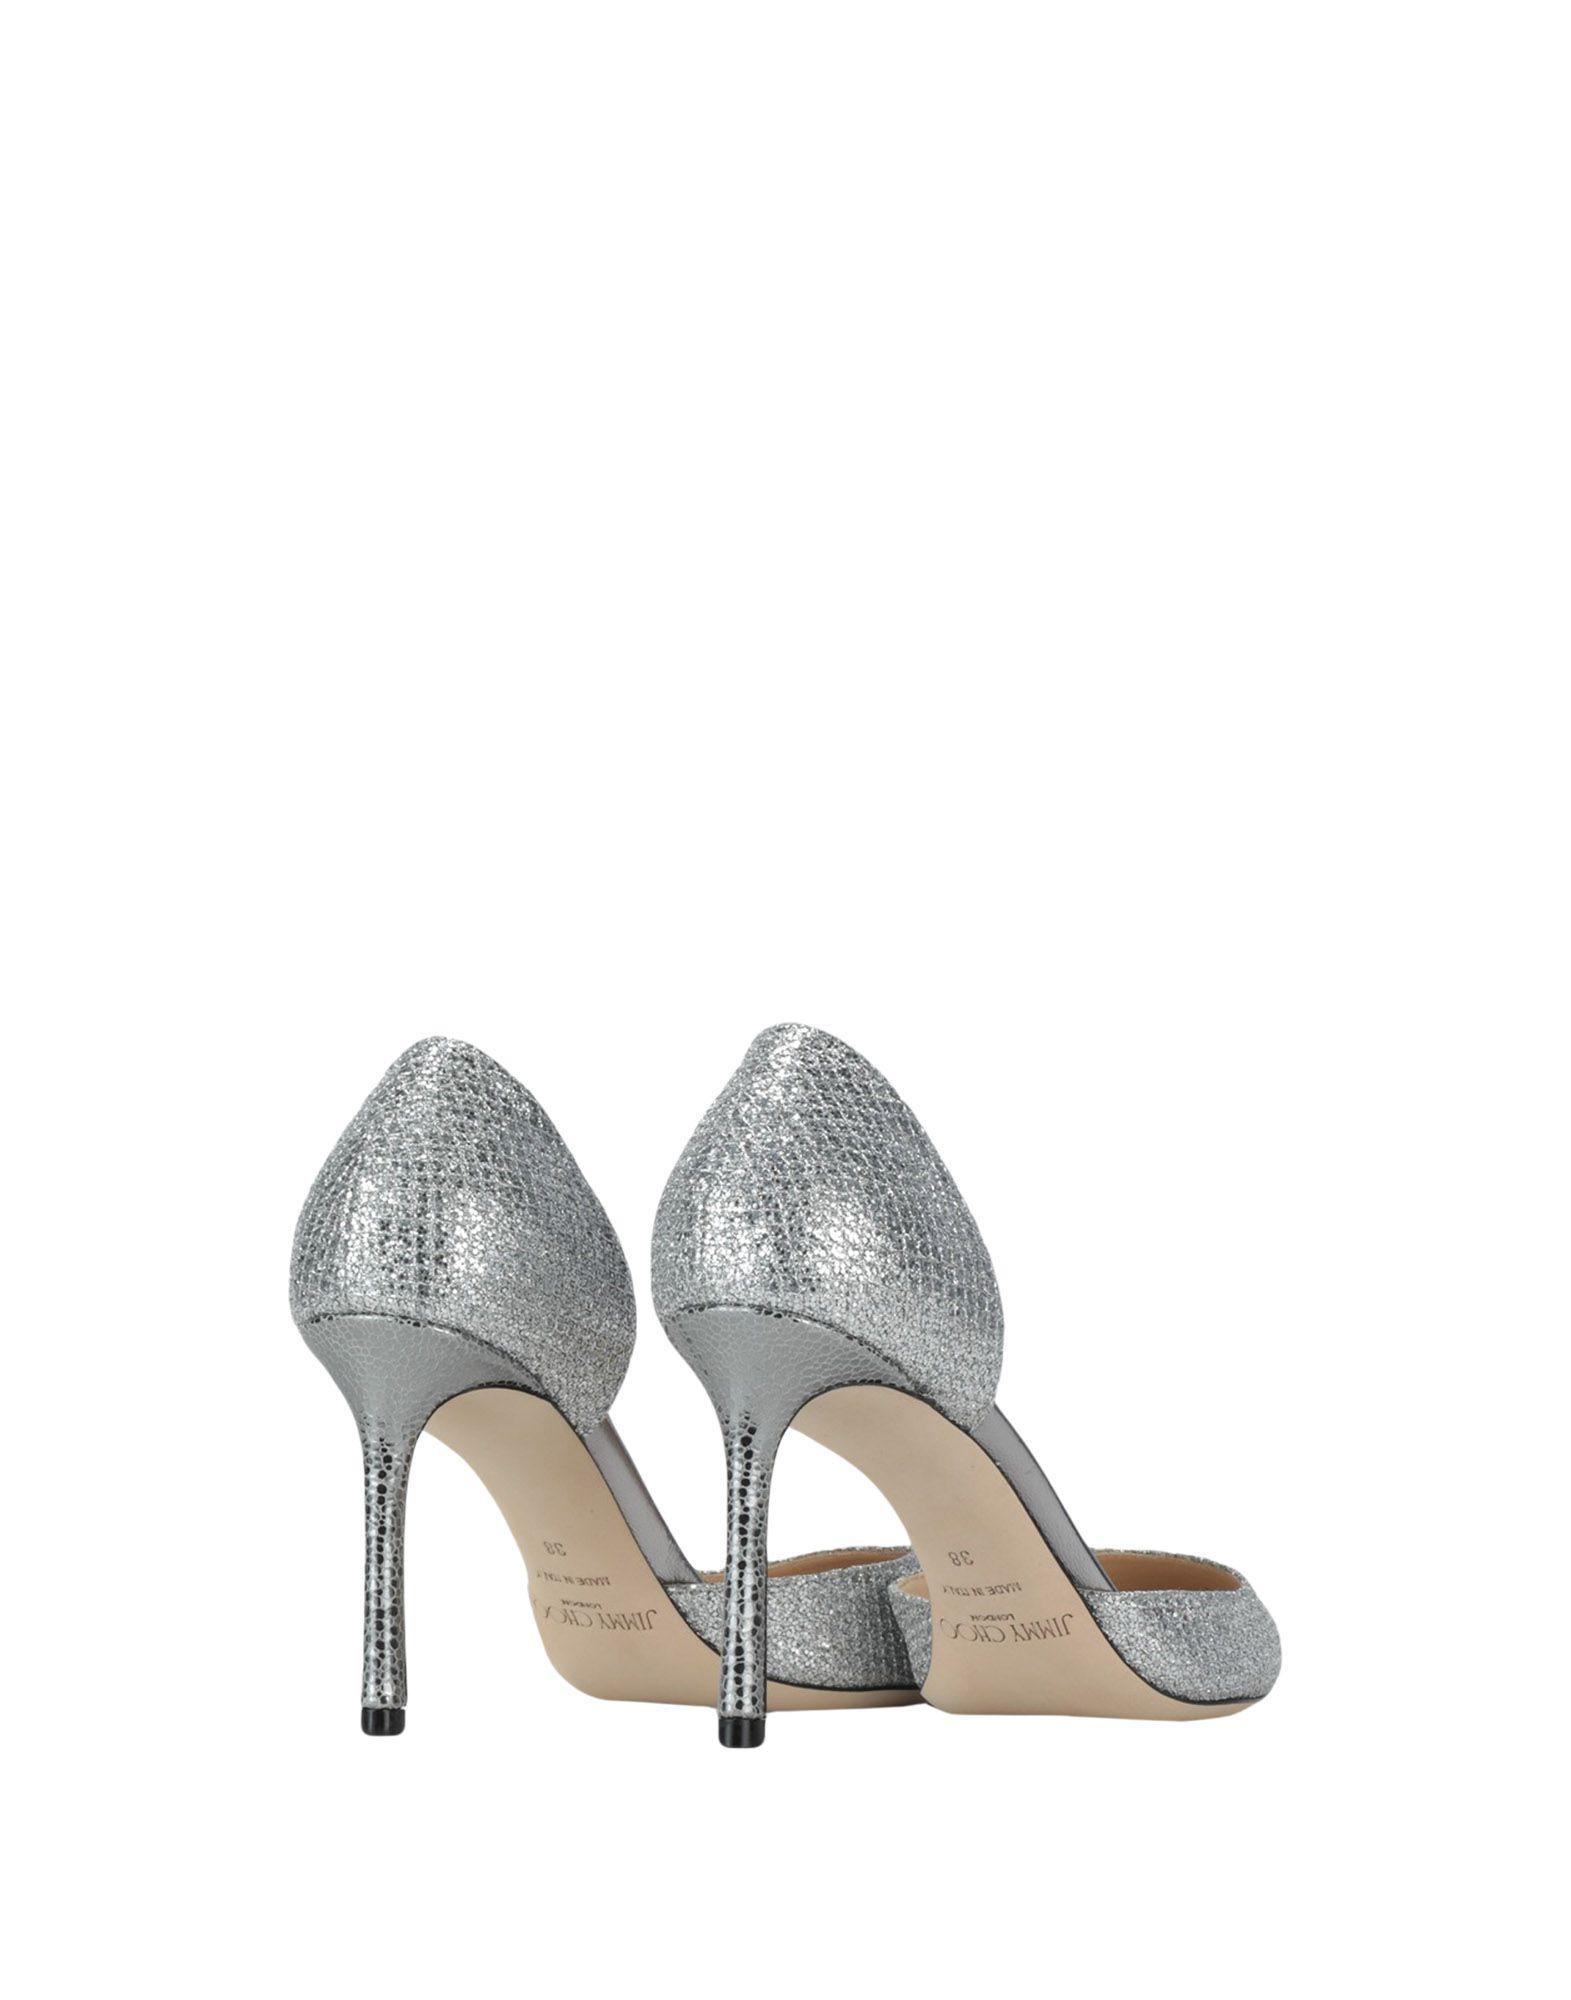 Rabatt Schuhe  Jimmy Choo Pumps Damen  Schuhe 11486847KJ 7c0fad